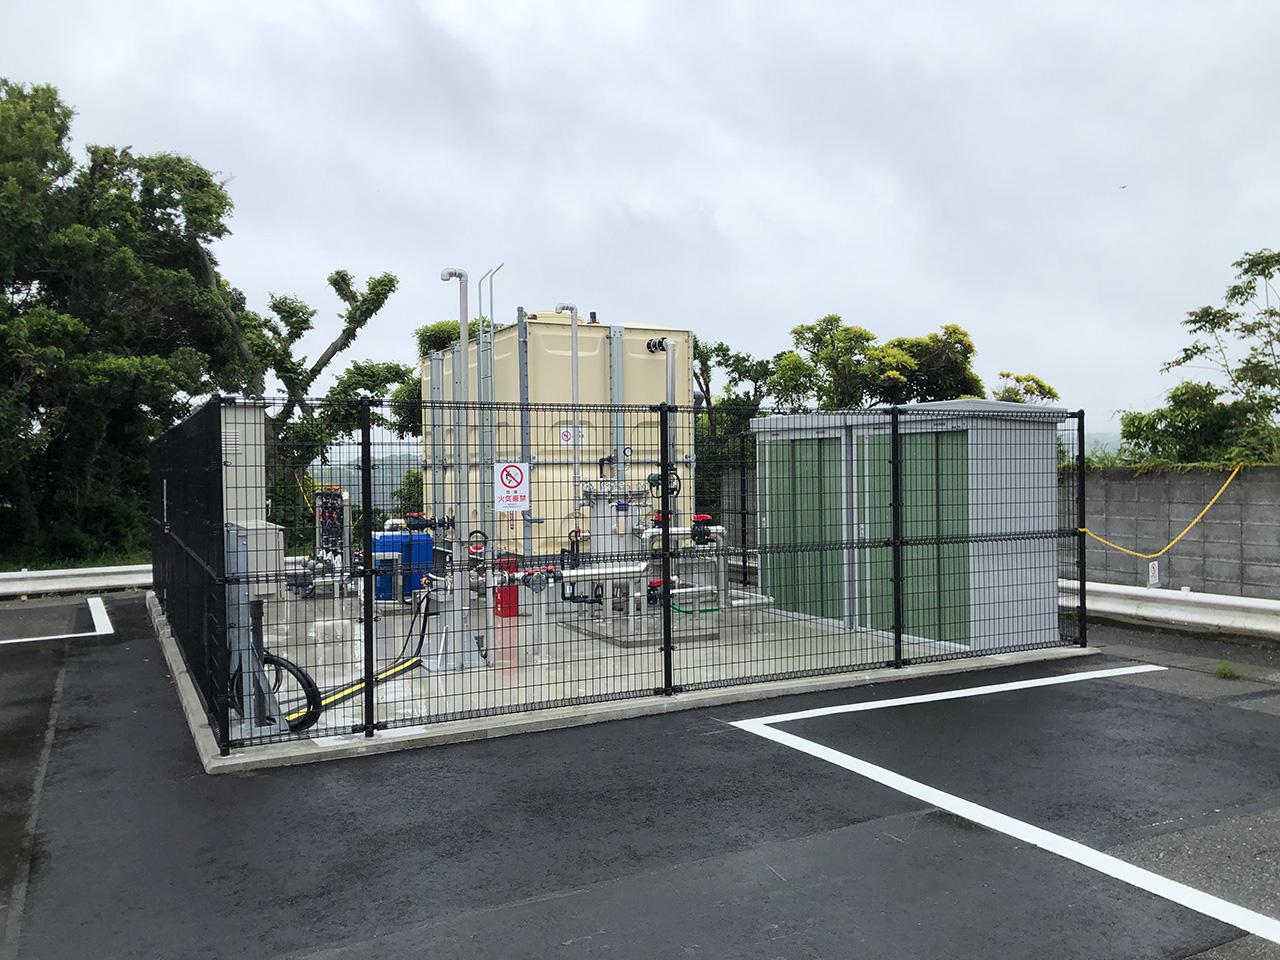 〈油壺温泉〉ホテル京急油壺・観潮荘の温泉揚湯設備